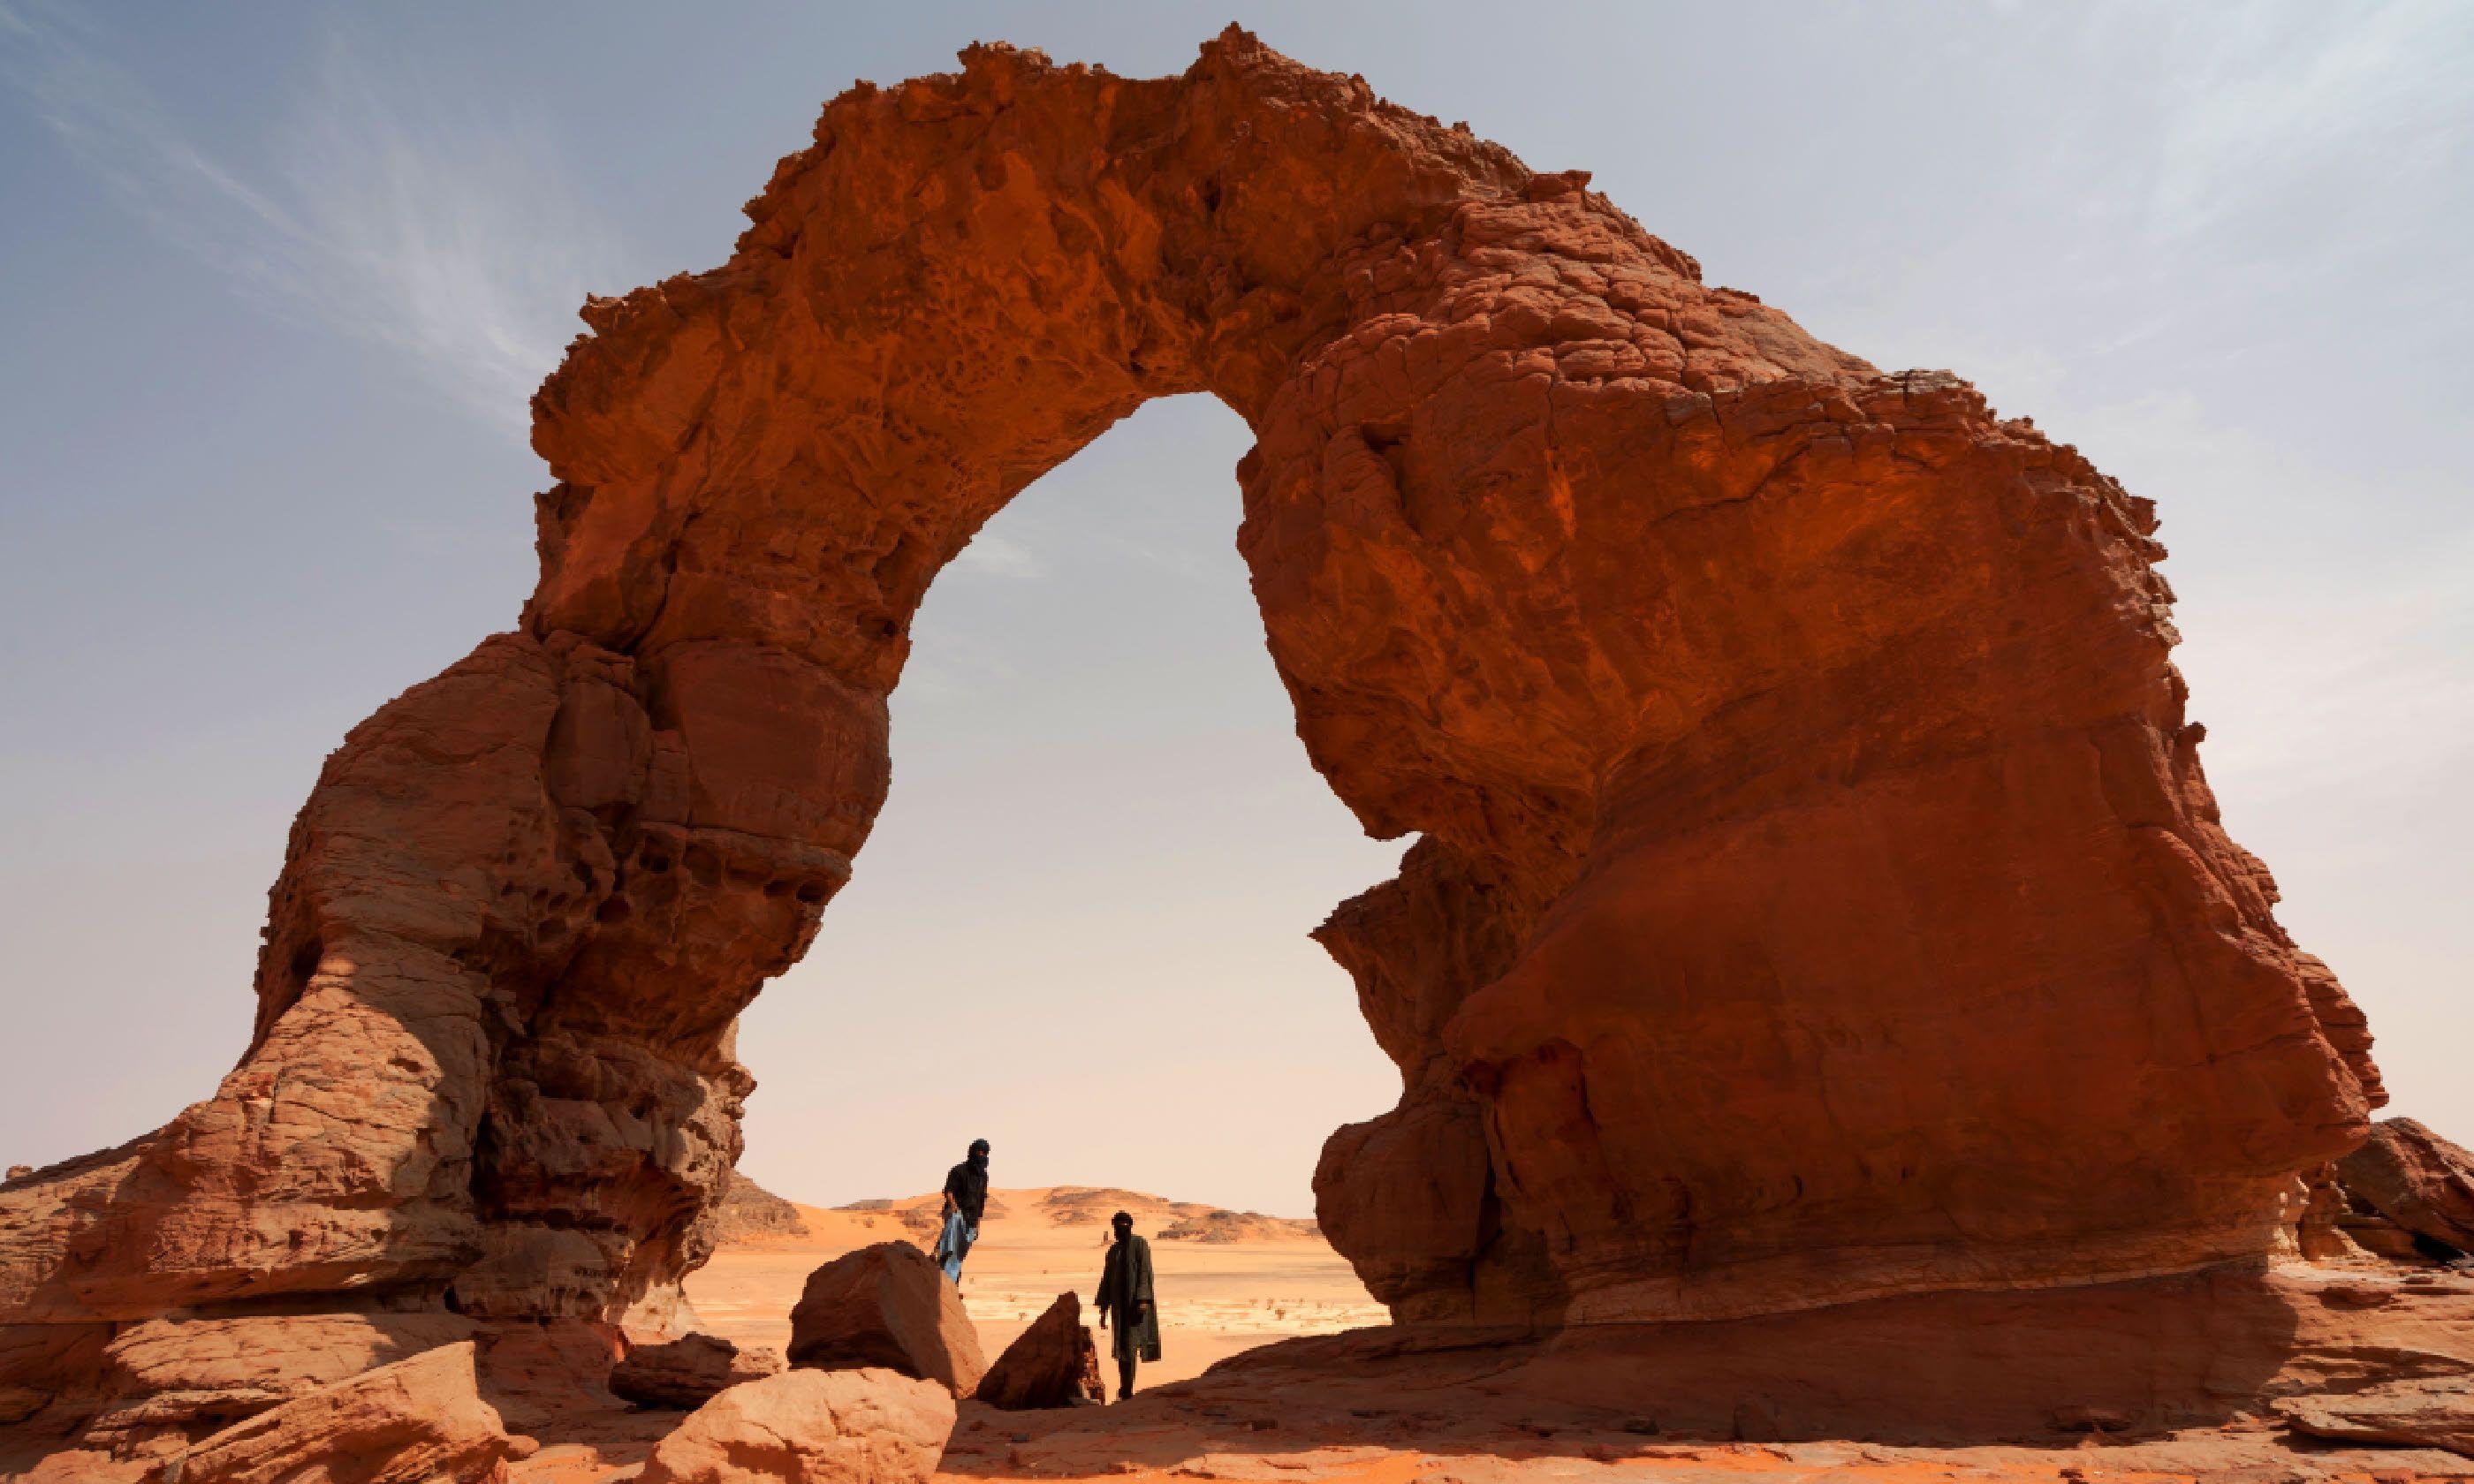 Stone arch in the Sahara Desert (Shutterstock)